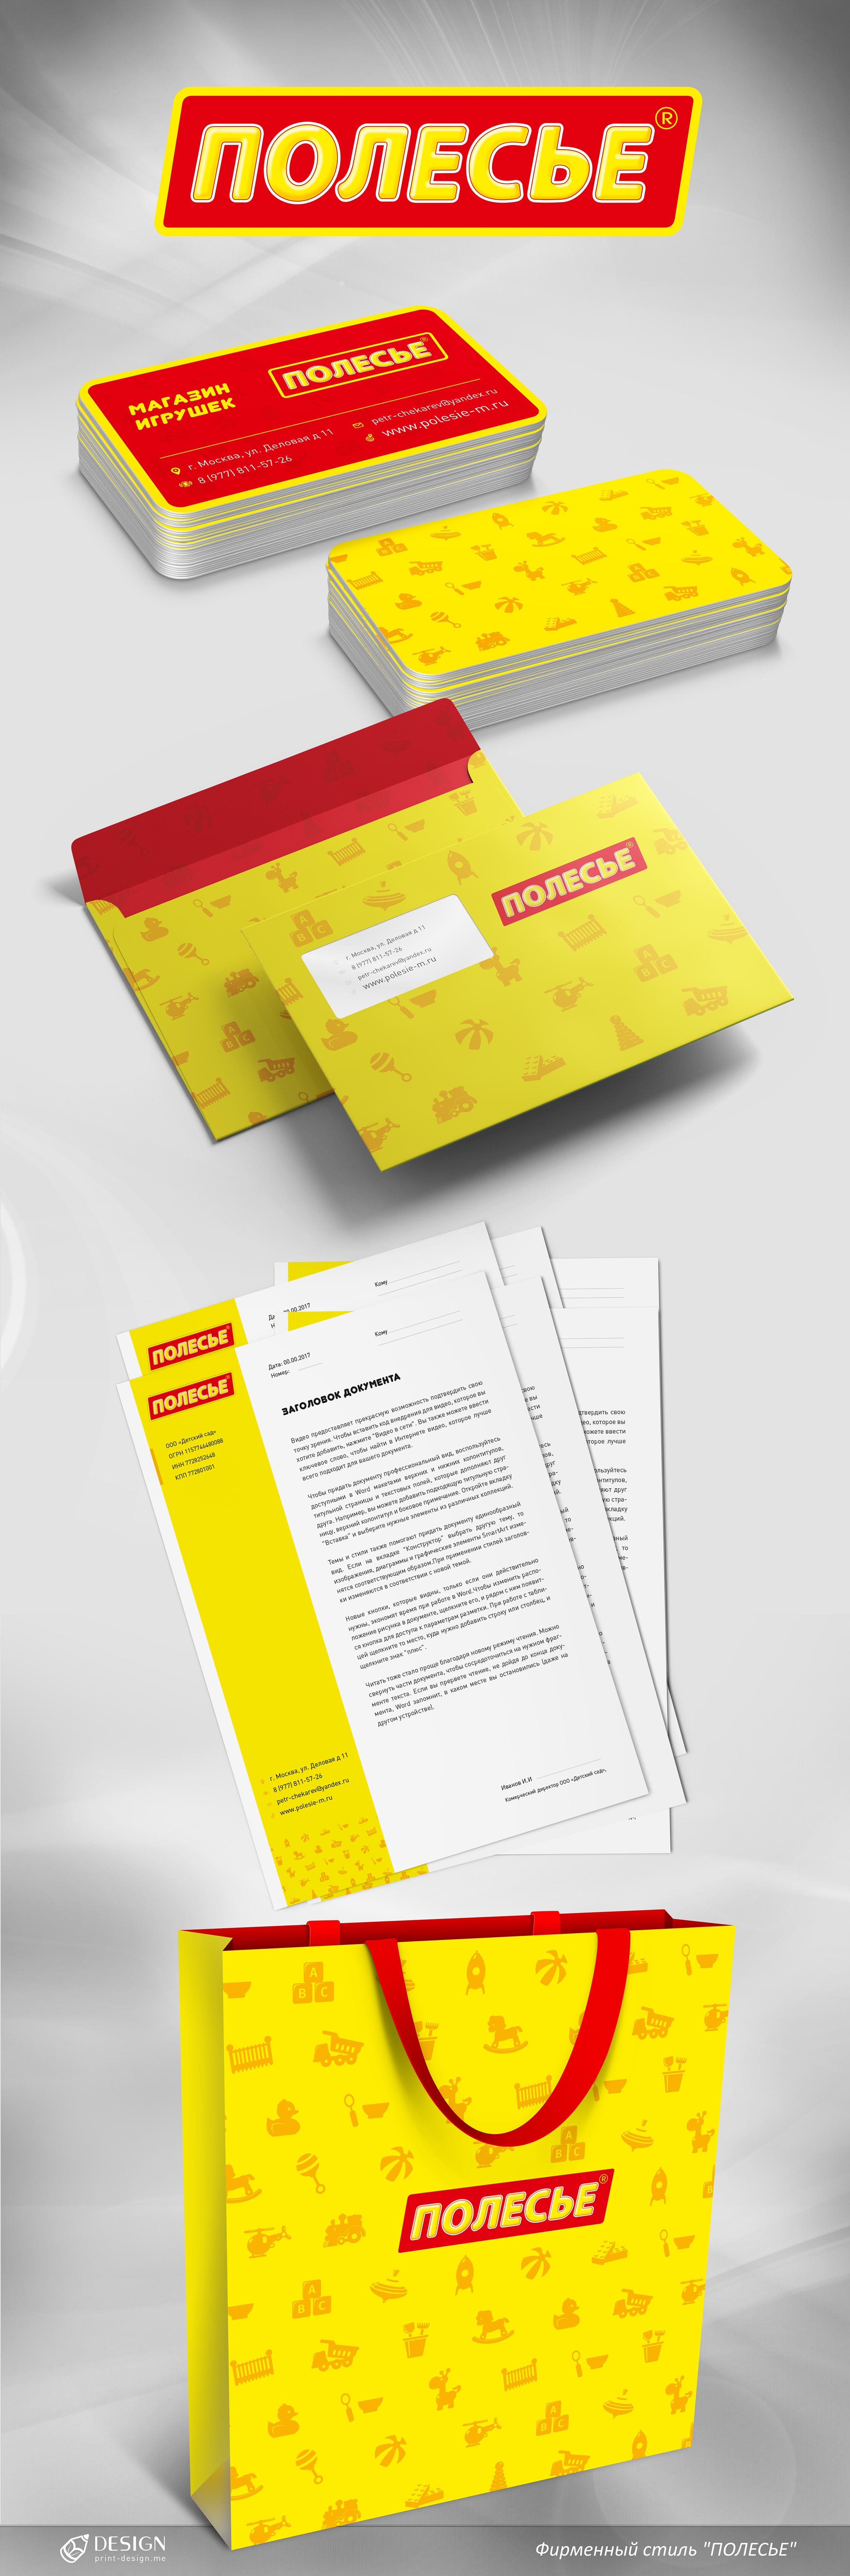 Разработка фирменного стиля на основании готового логотипа фото f_1935ab0fac6bb94f.jpg